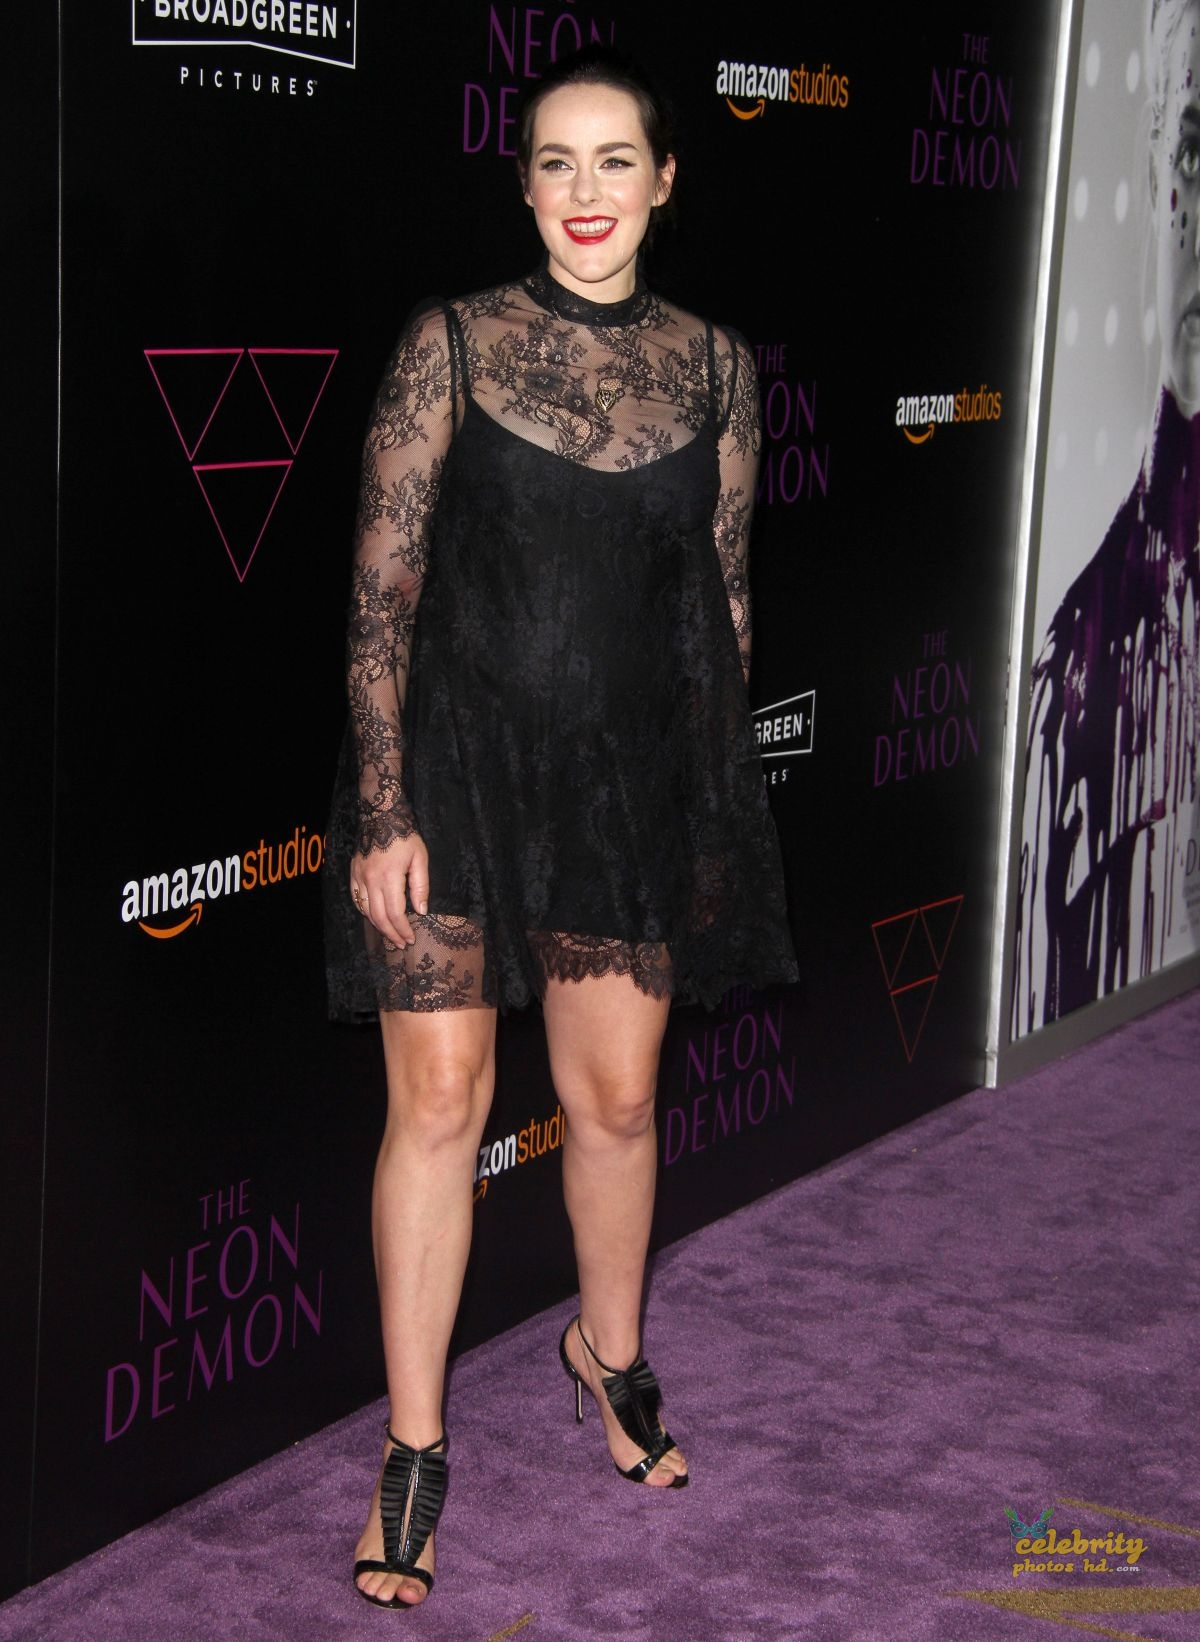 JENA MALONE at 'The Neon Demon' Premiere in Los Angeles (4)